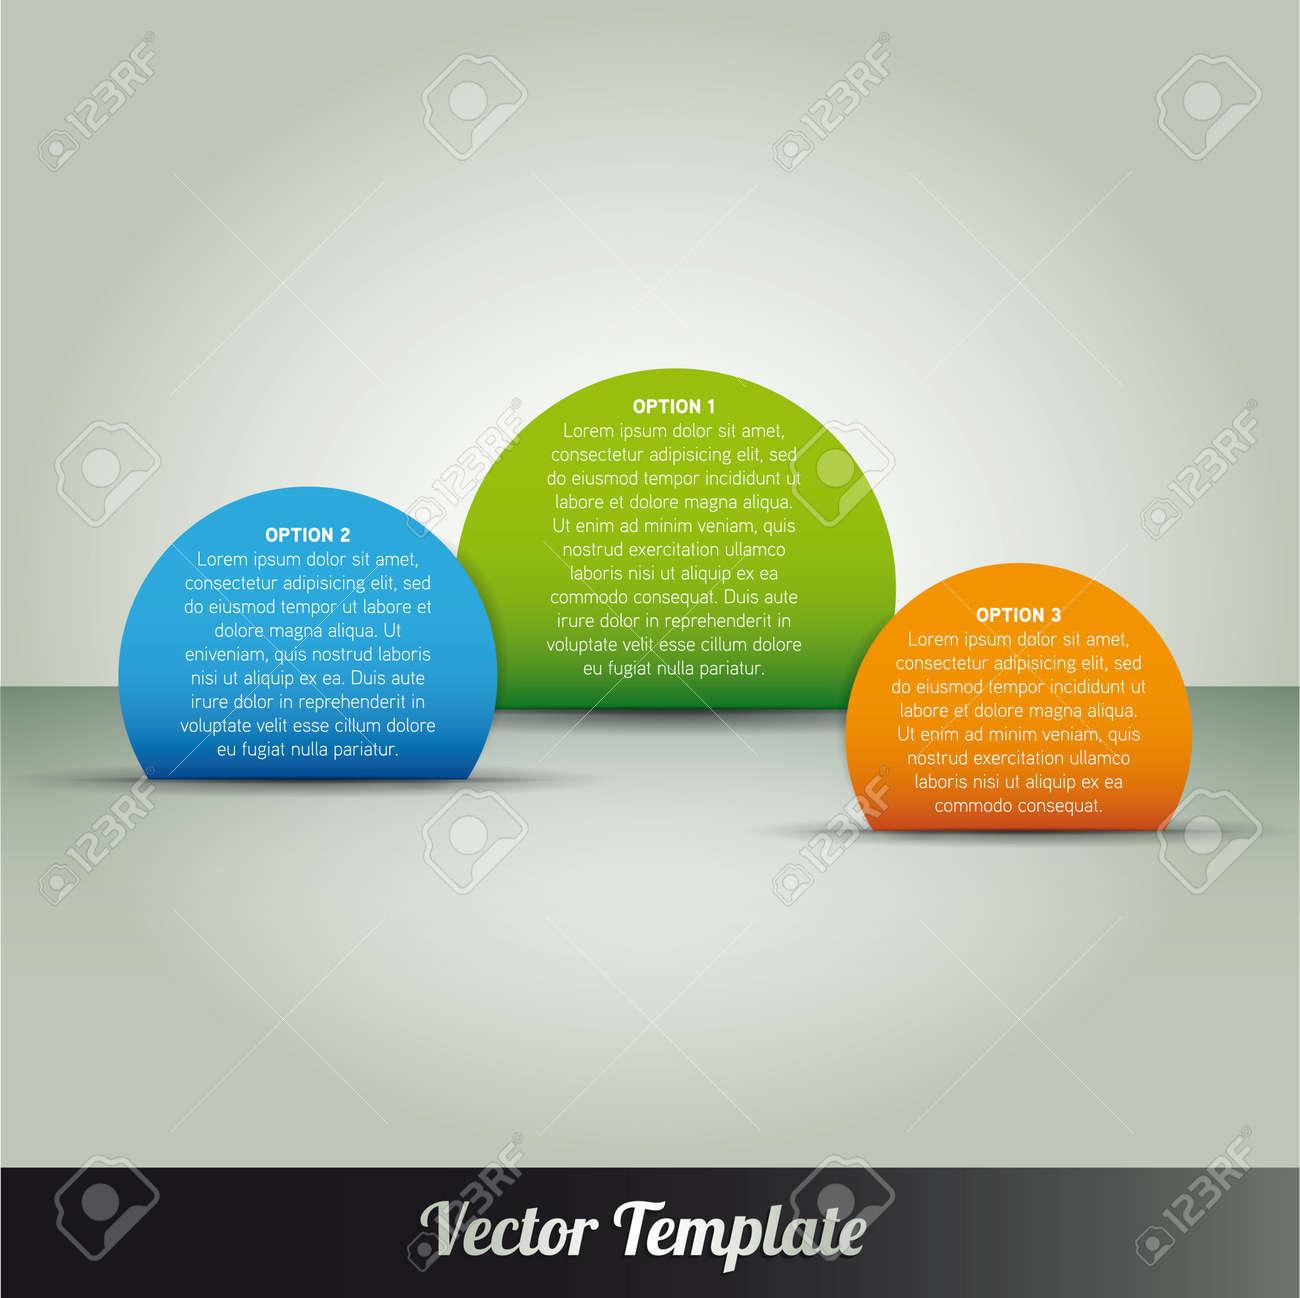 Template Stock Vector - 17798187